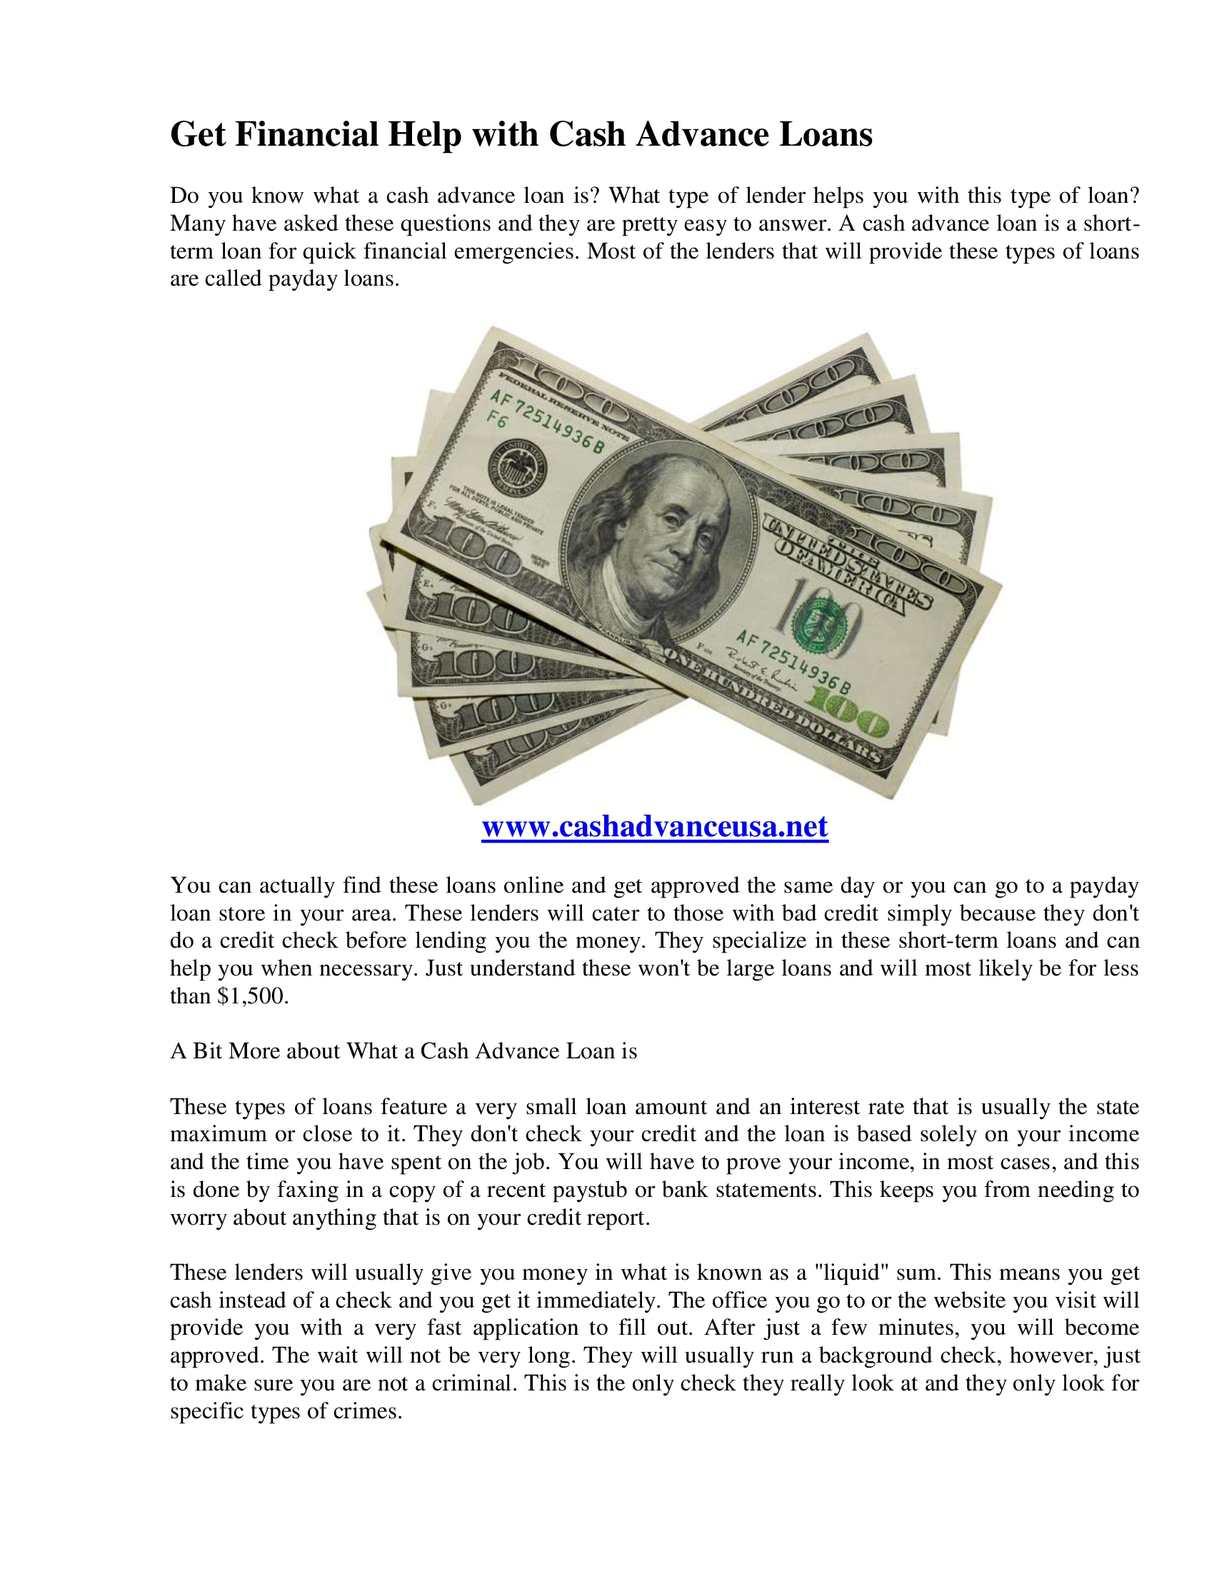 Cash Advance Loans >> Calameo Get Financial Help With Cash Advance Loans